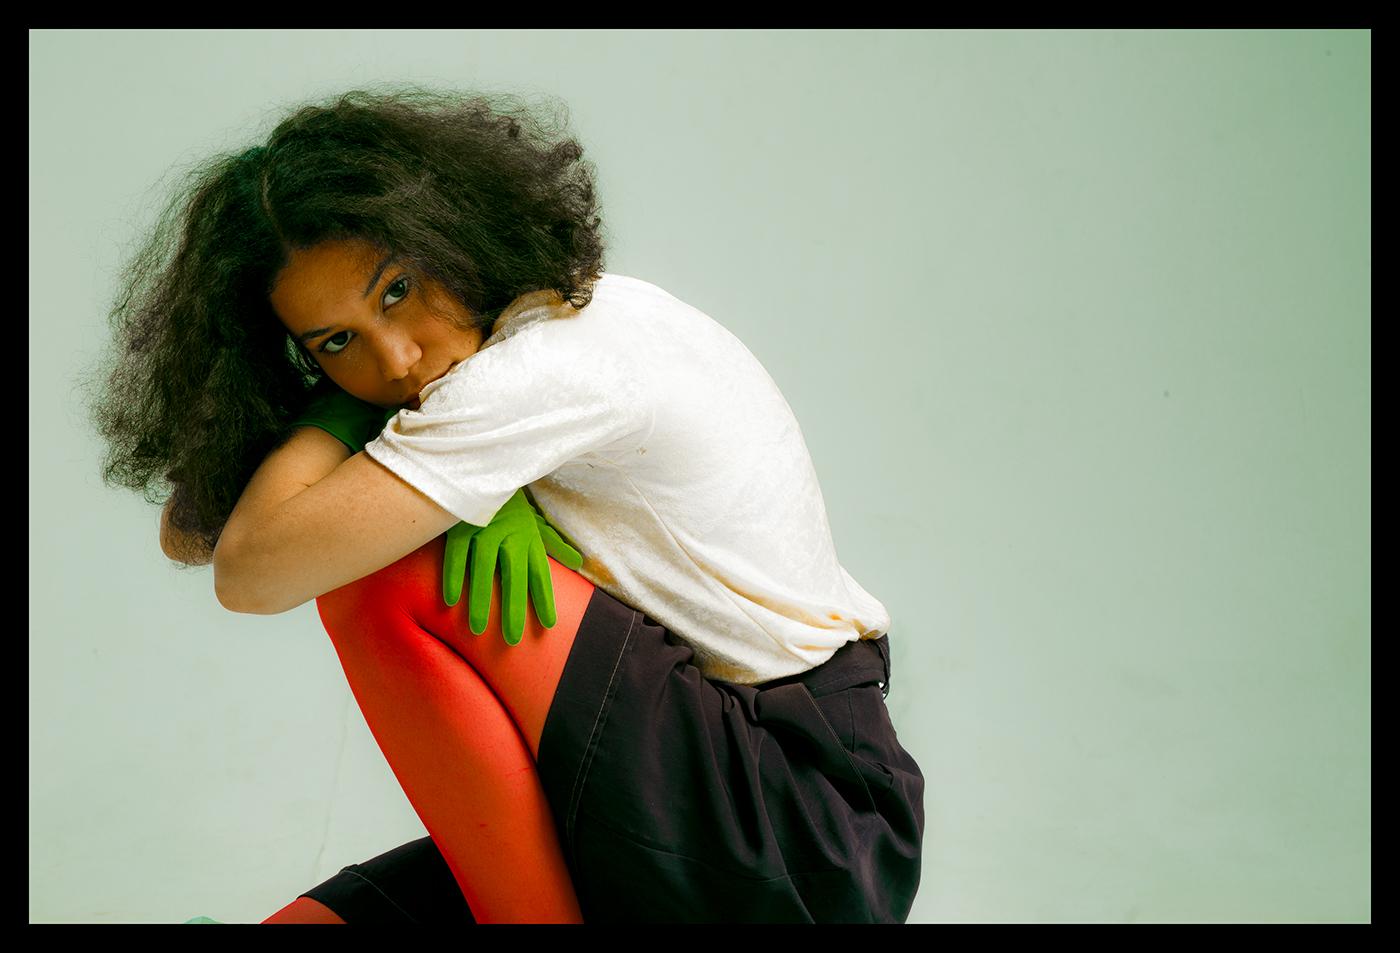 Мариам / фото Никита Флёнов